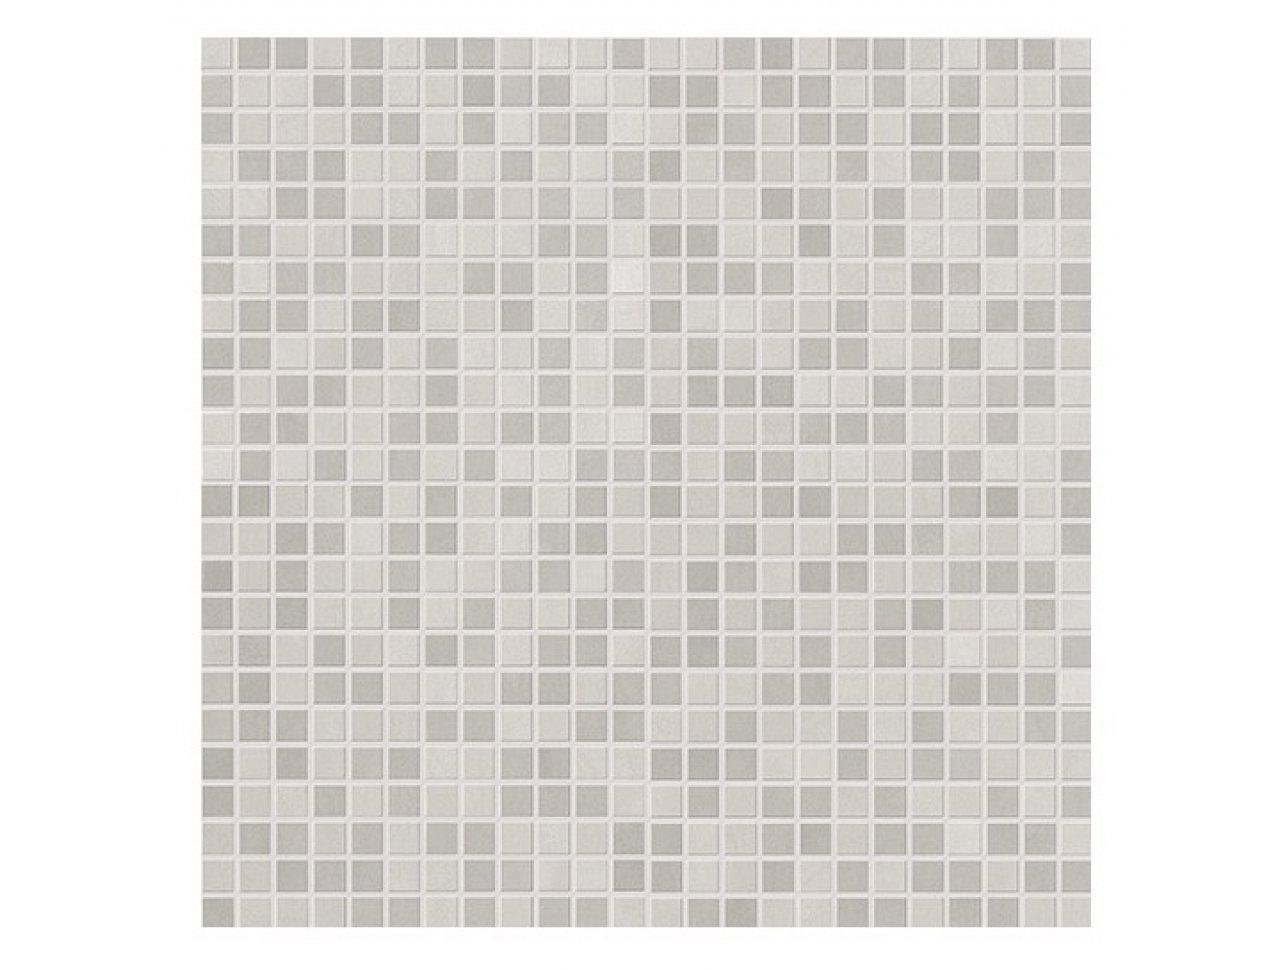 Мозаика FAP Color Now Perla Micromosaico 30.5 x 30.5 см, Арт. fMTP